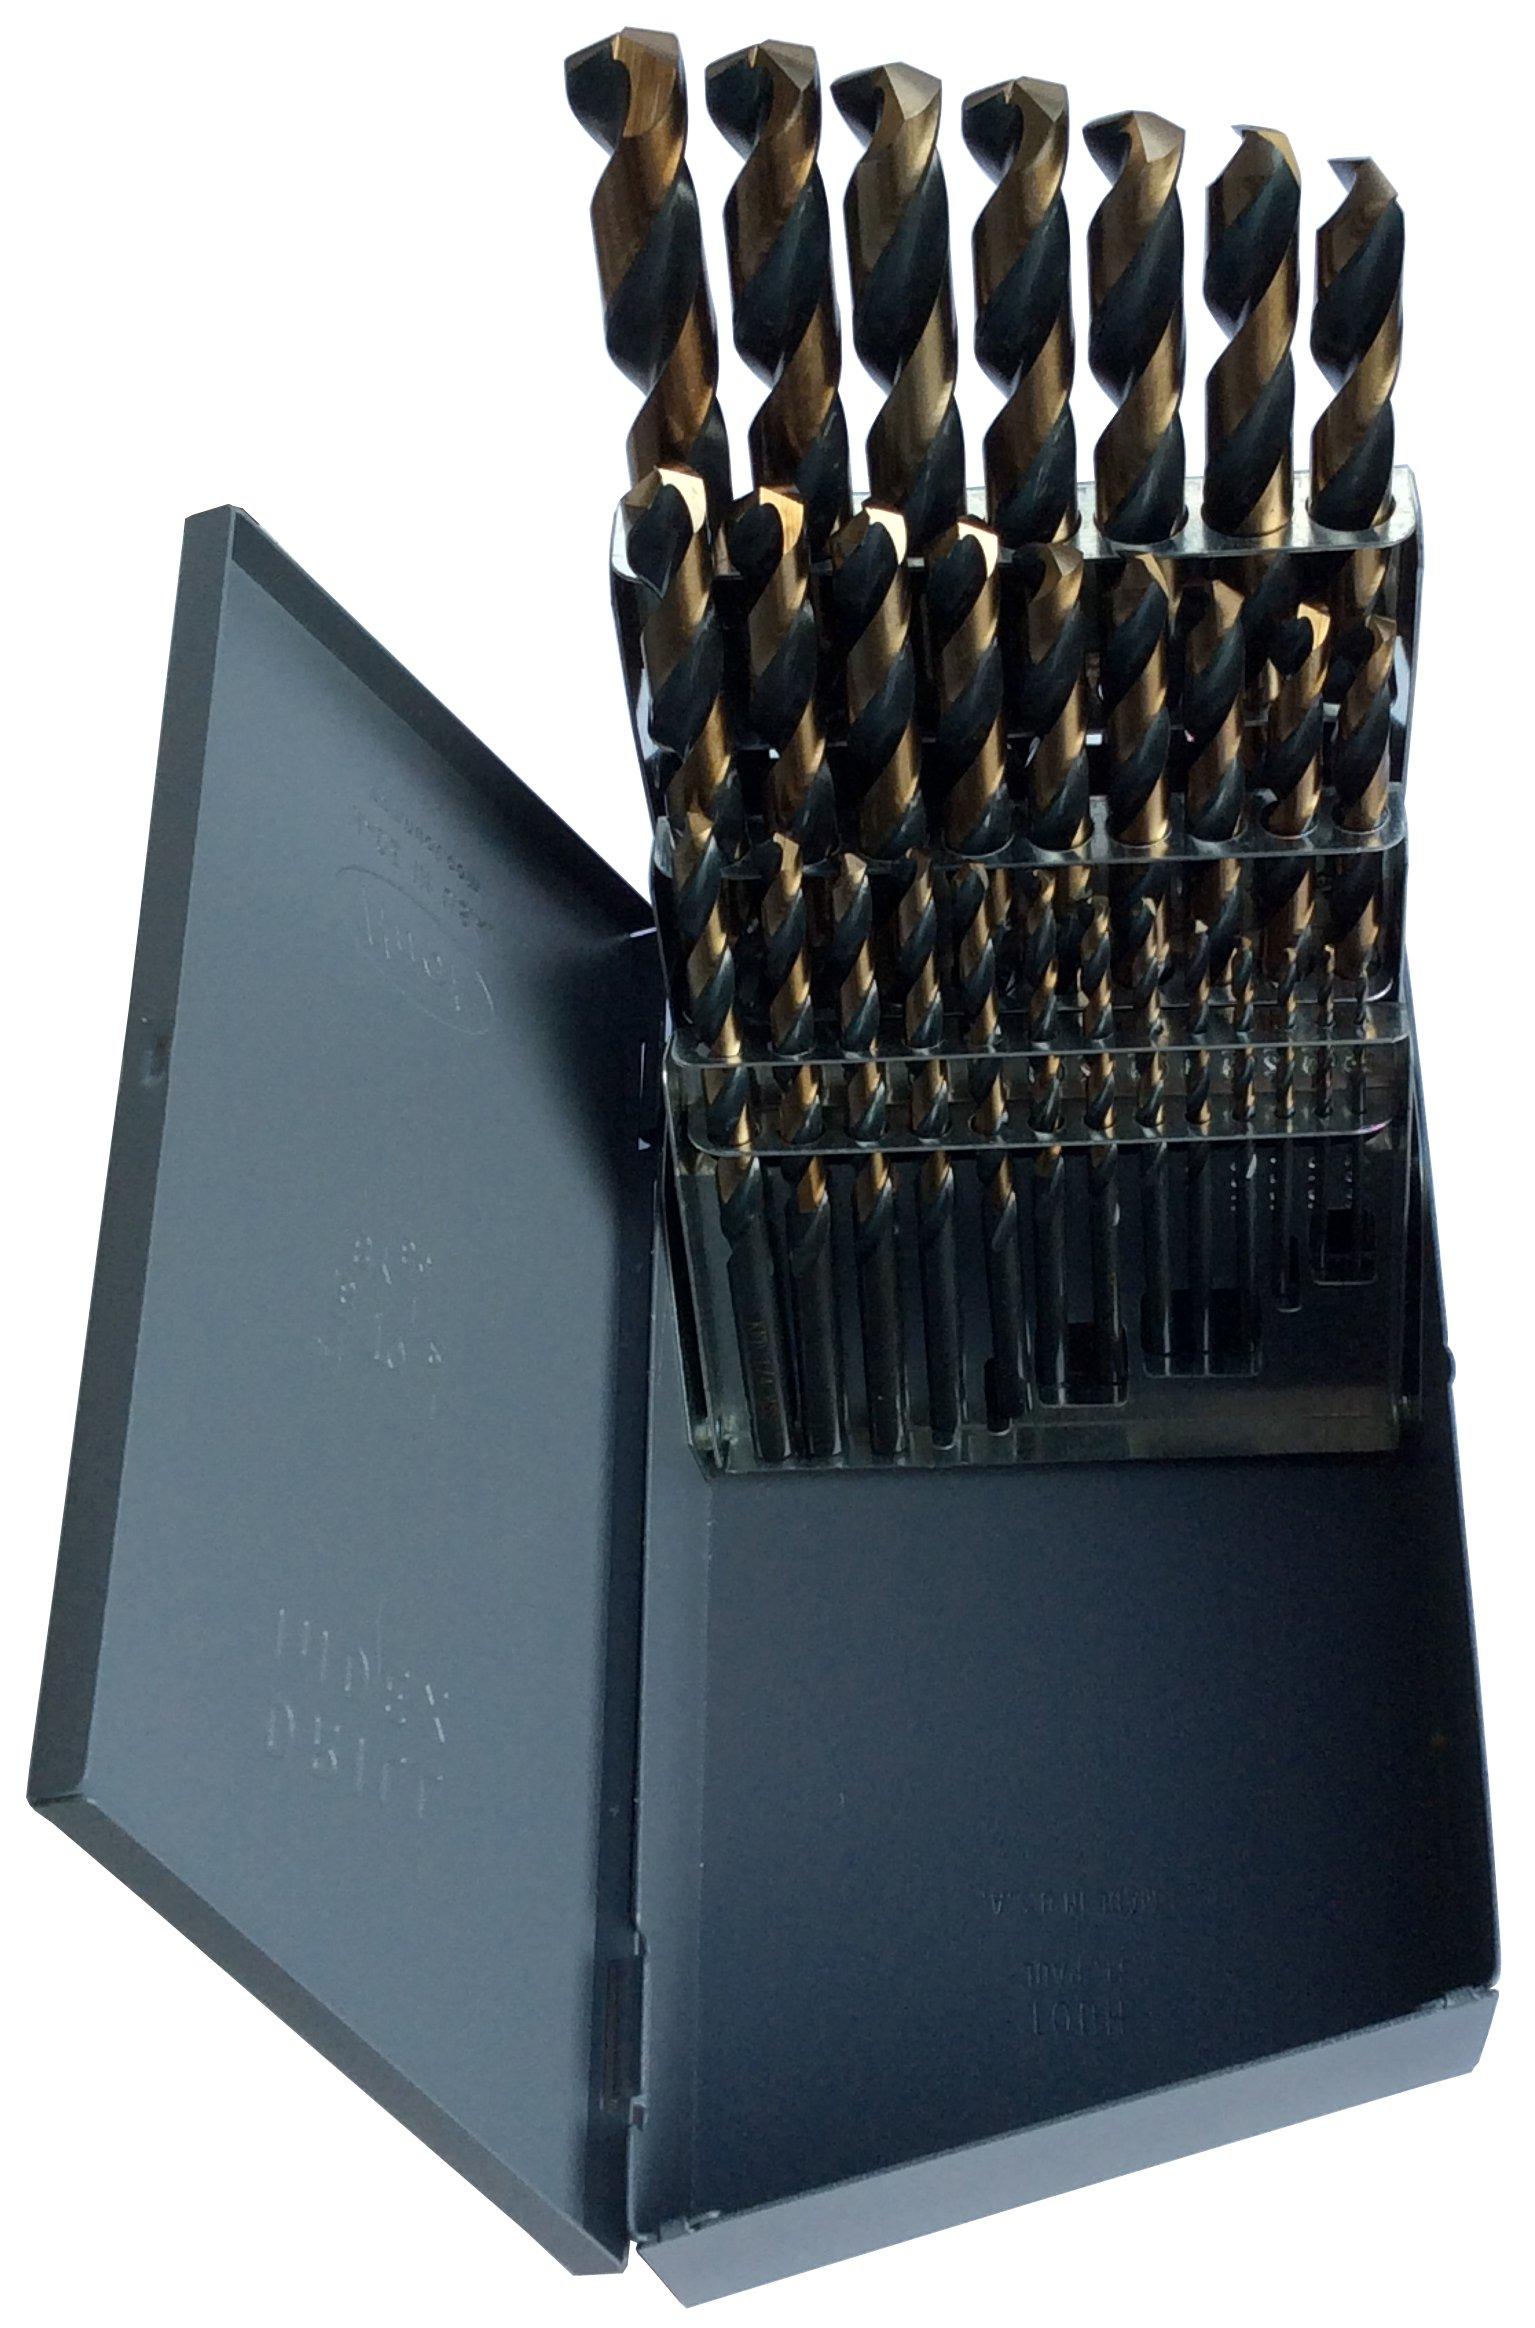 Drill America KFD29J-SET KFD 29 Piece High-Speed Steel Jobber Length Drill Bit Set in Metal Case, Black/Gold Oxide Finish, Round Shank, Spiral Flute, 135 Degrees Split Point (Pack of 1)